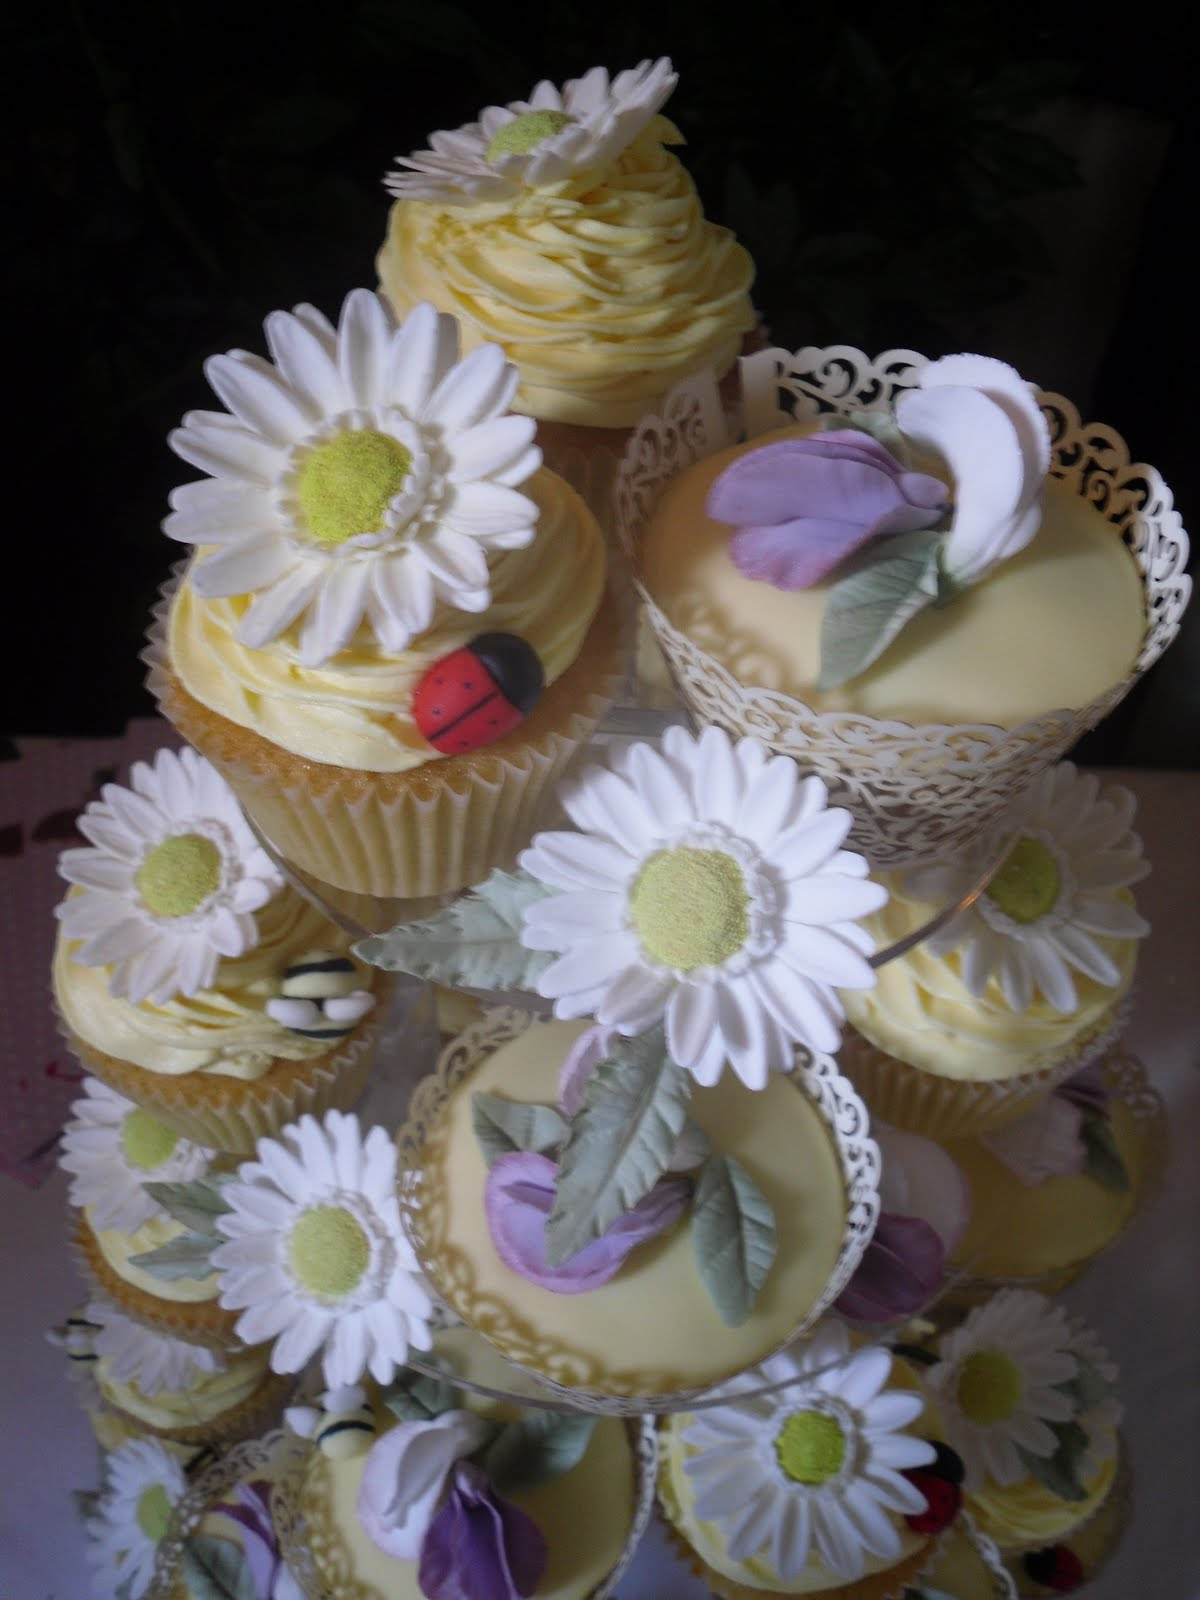 Katies Cupcakes Sweet Pea and Daisy Wedding Cupcakes